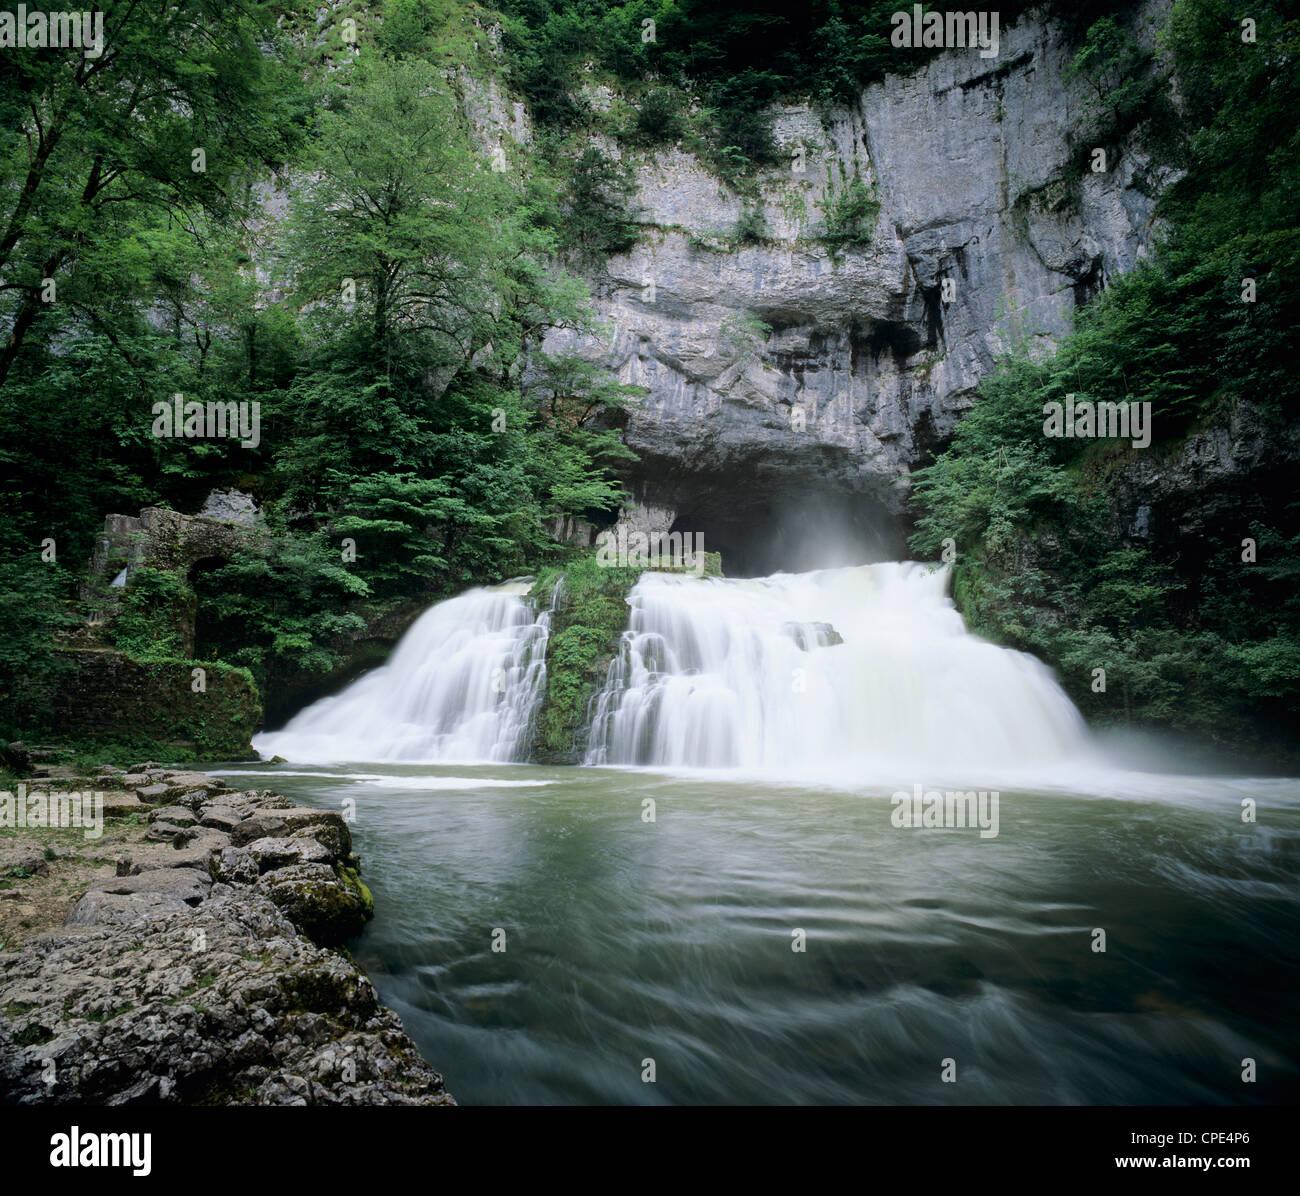 La Cascada del río Lison saliendo de metro, Source du Lison, Nans-sous-Santa Ana, Jura, Franche Comte, Francia, Imagen De Stock